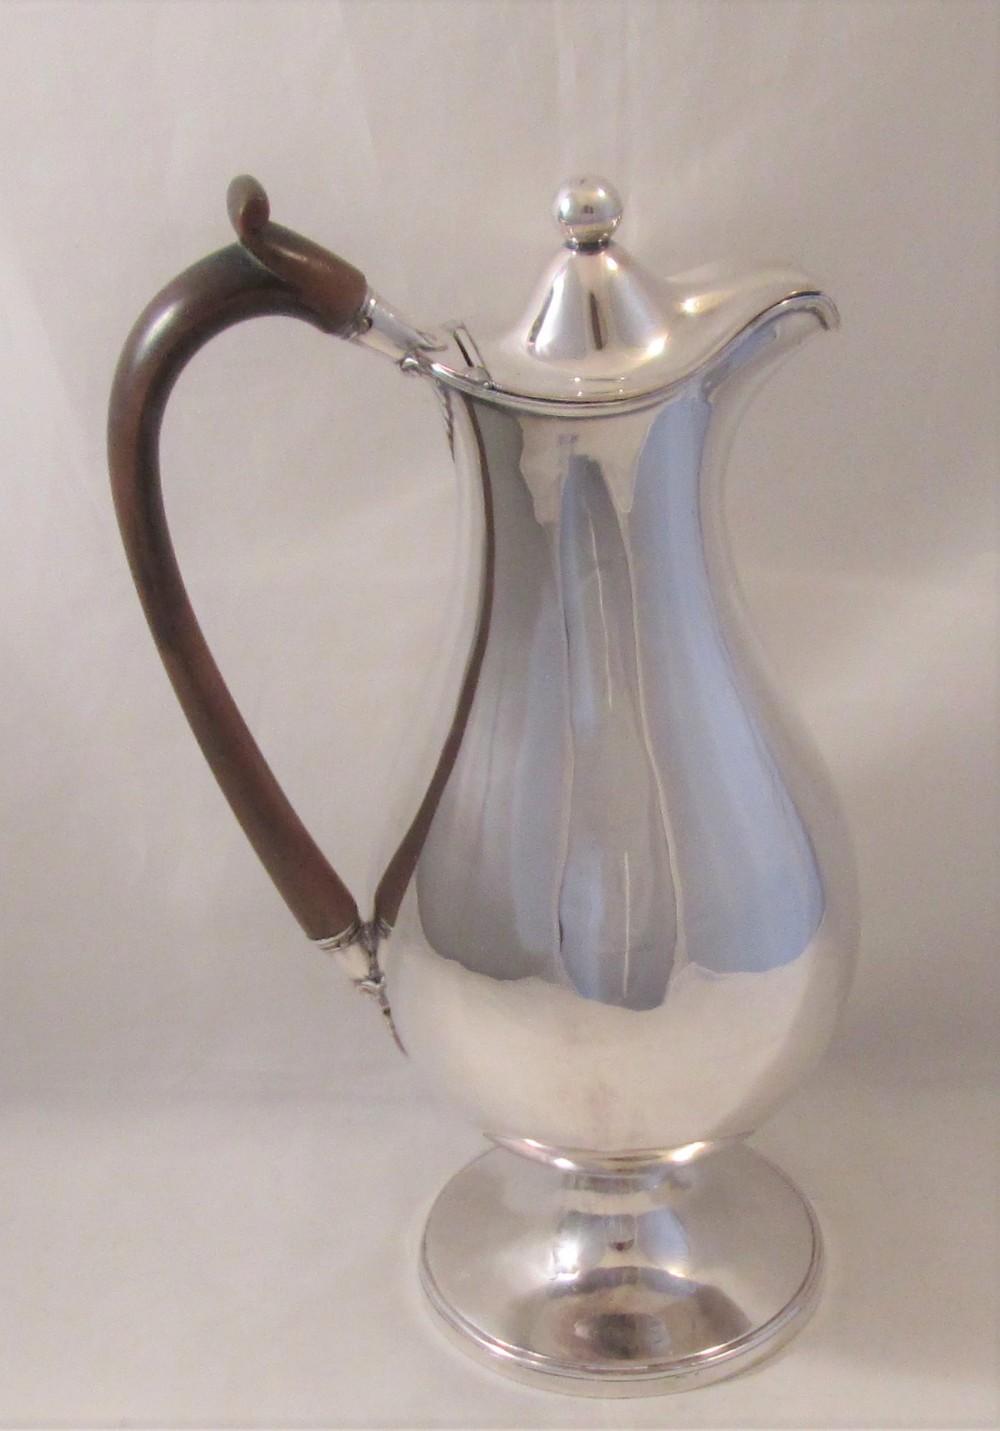 19th century silver plated wine ewer jug c1860